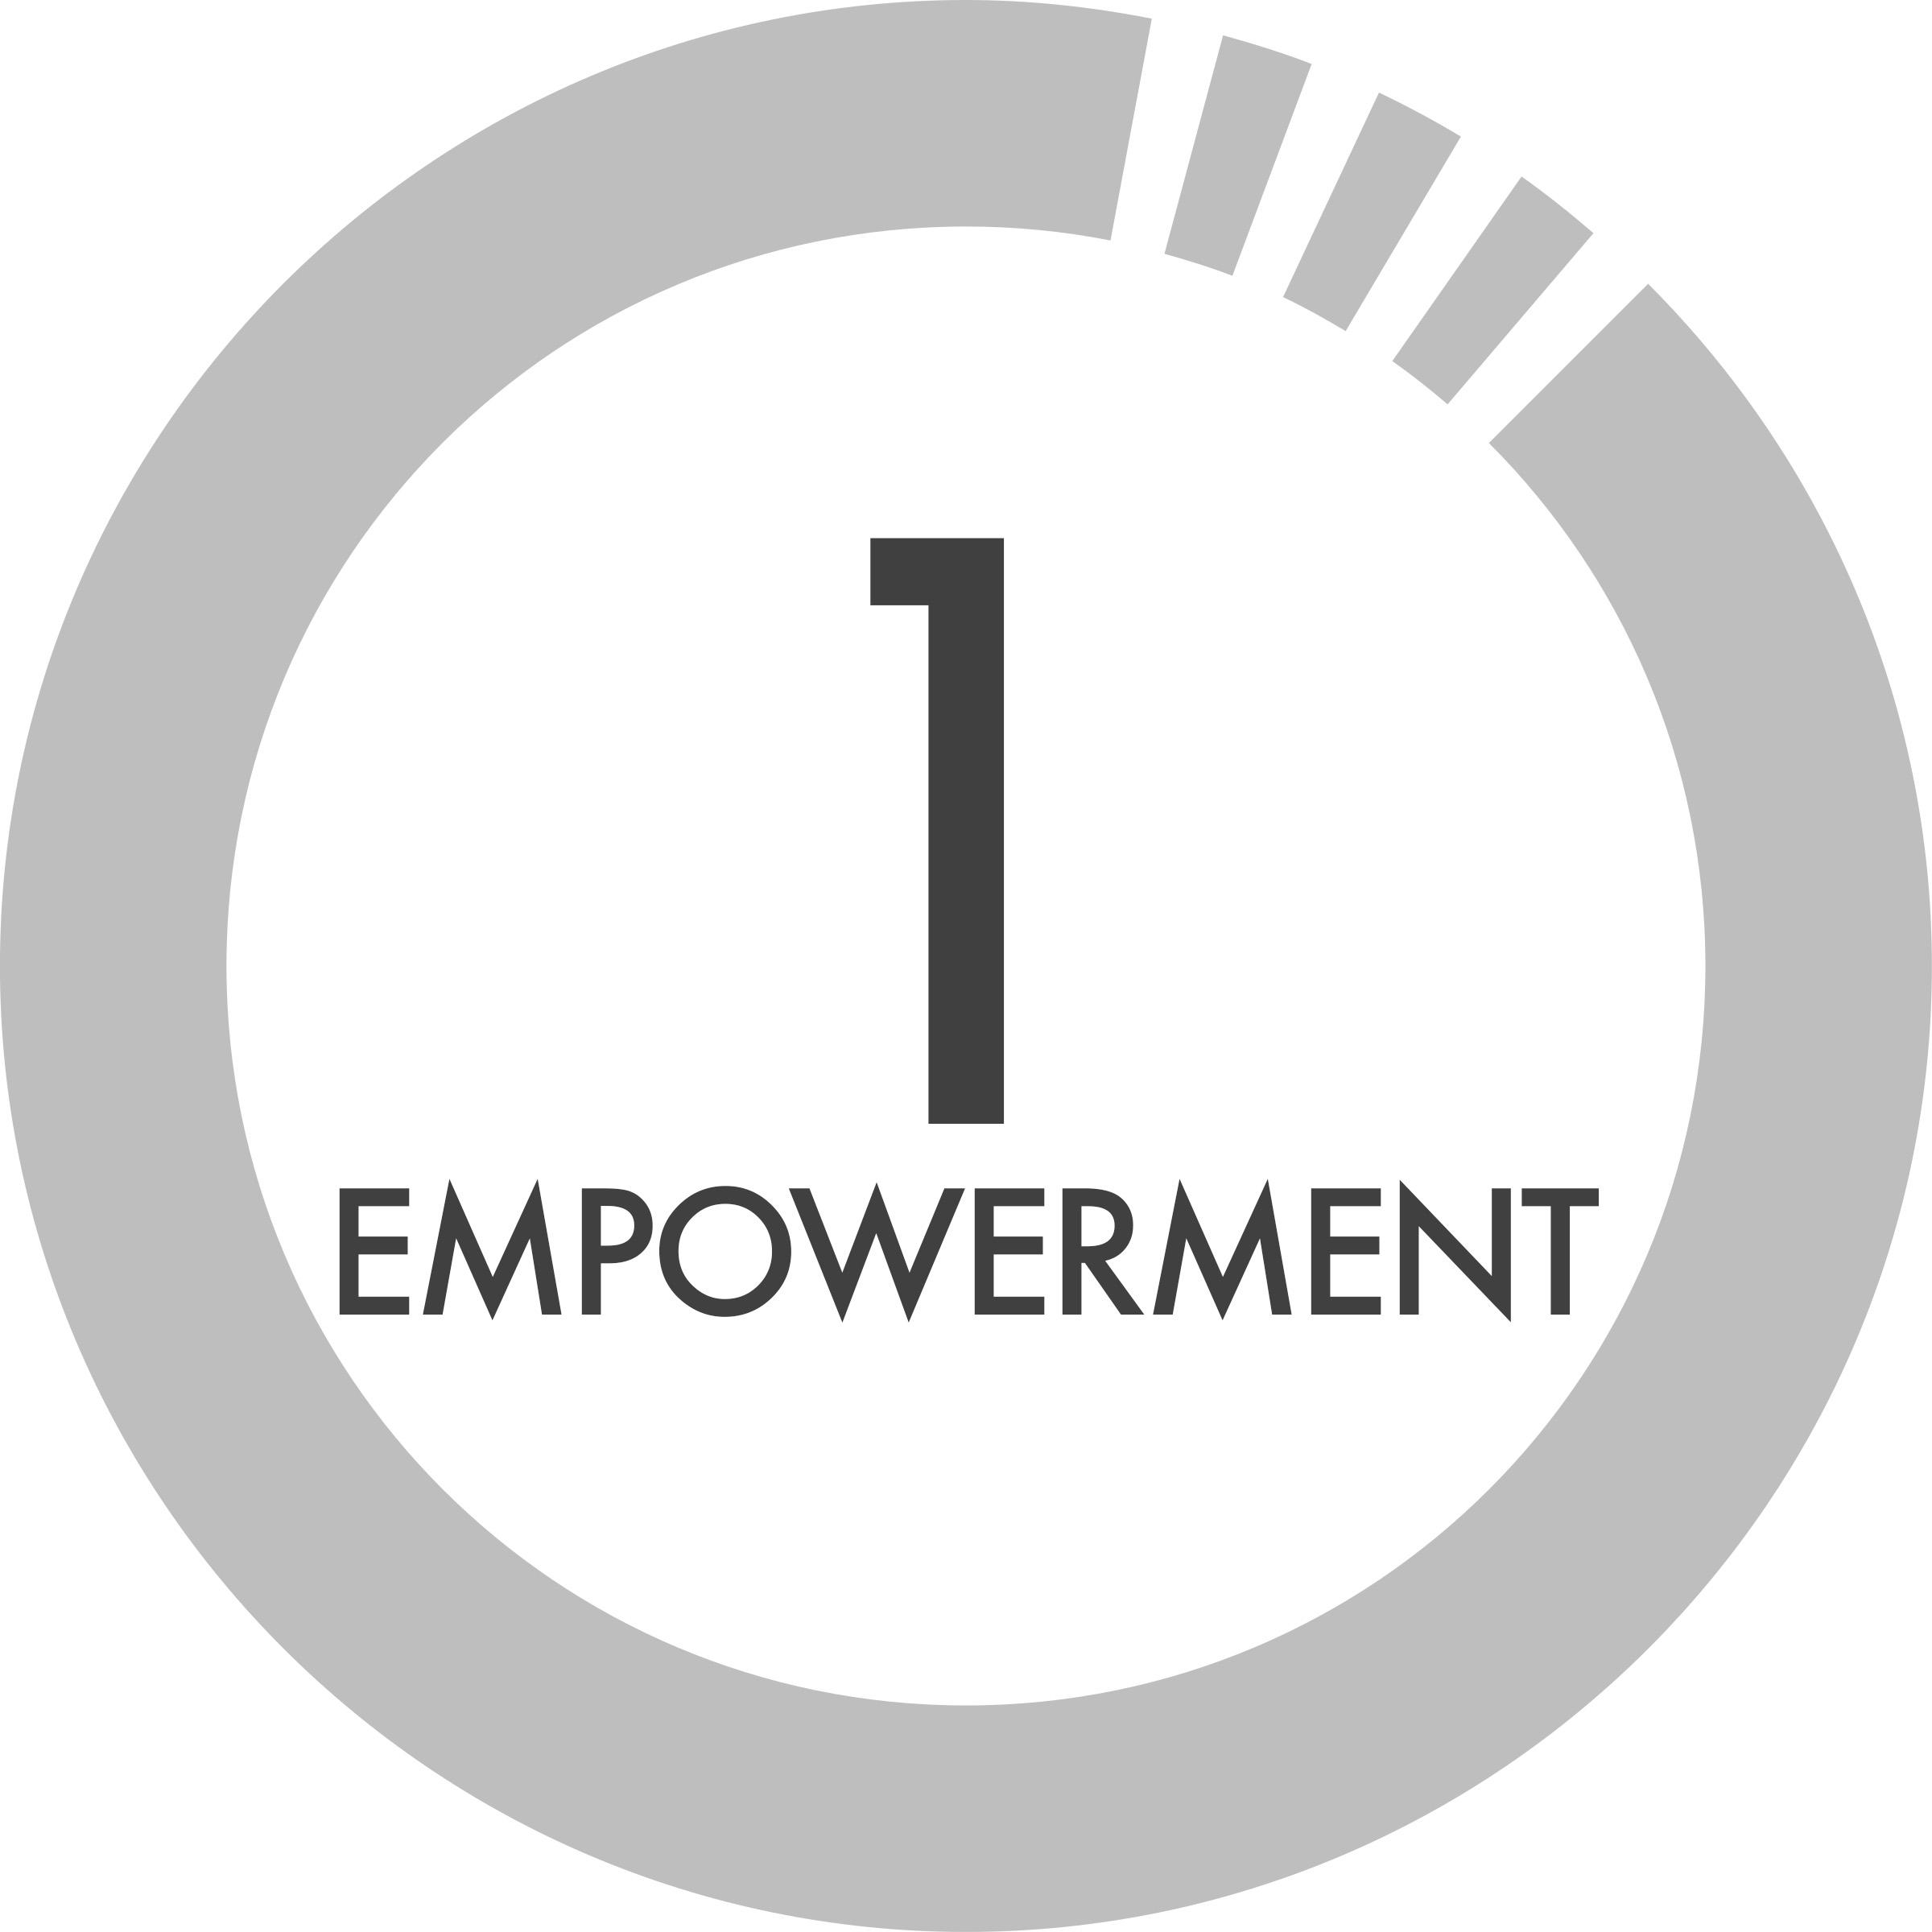 Empowerment Circle 1.jpg